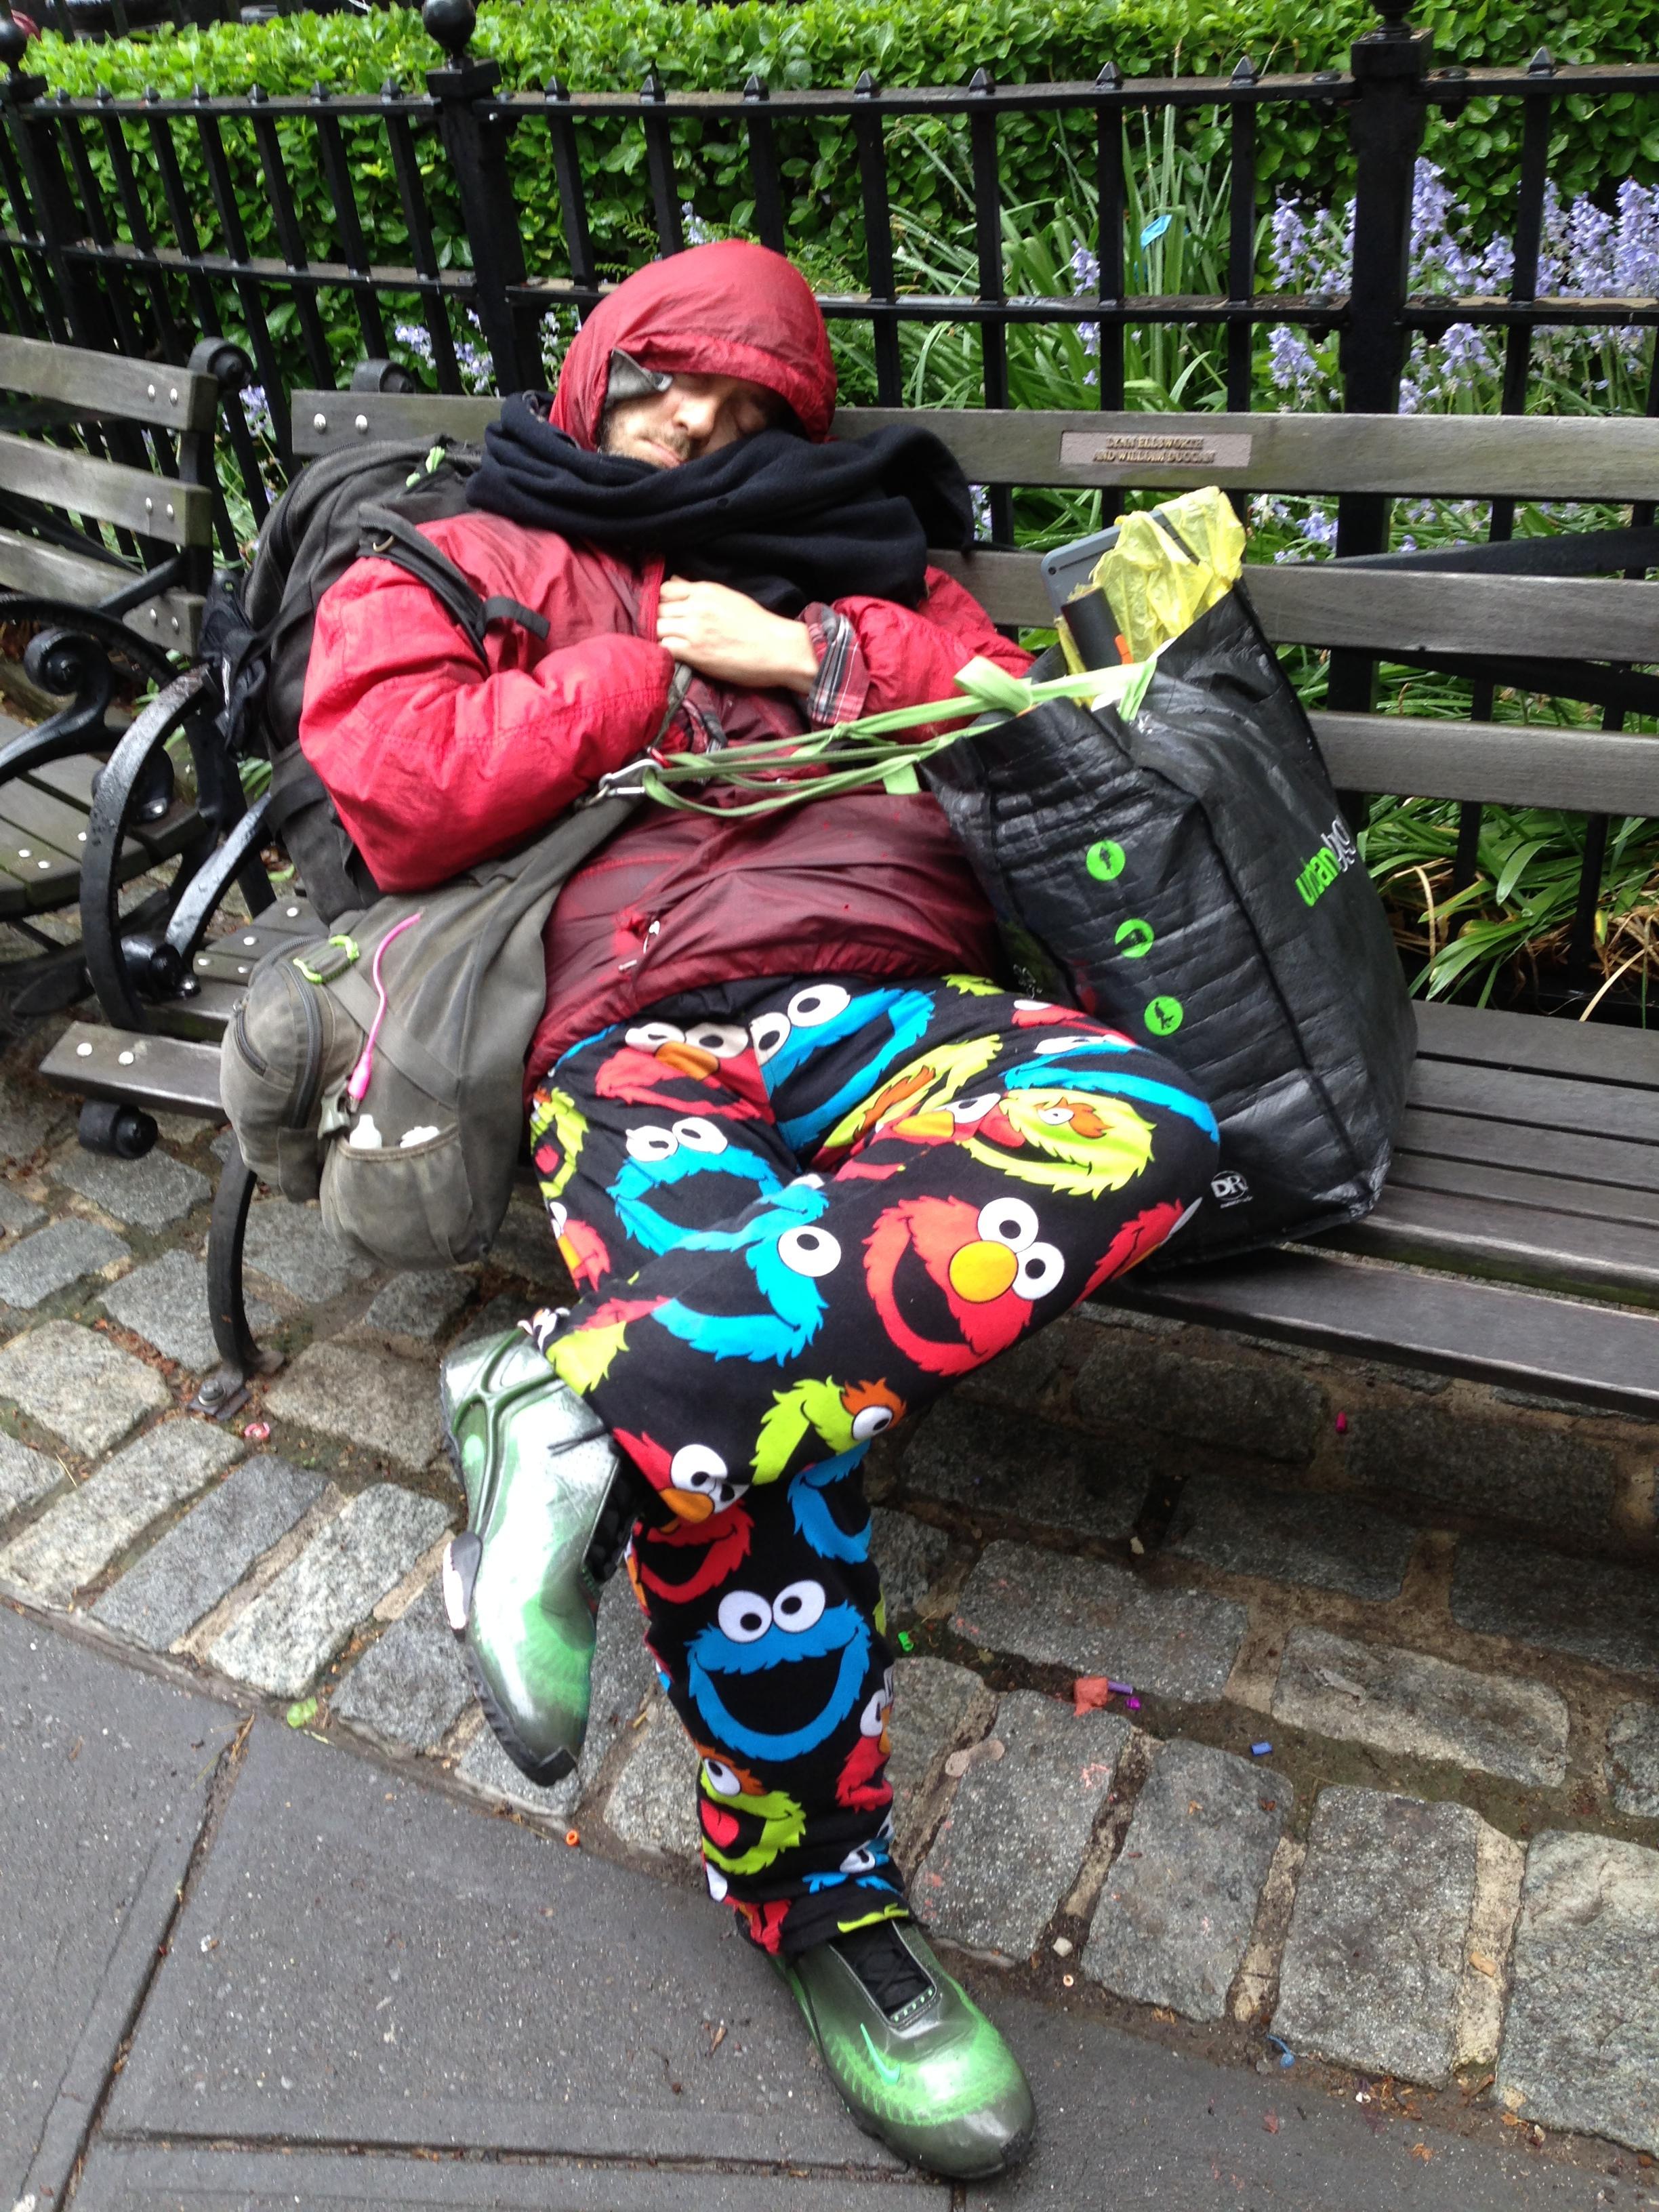 Funky sleeper, Duane Park, Tribeca